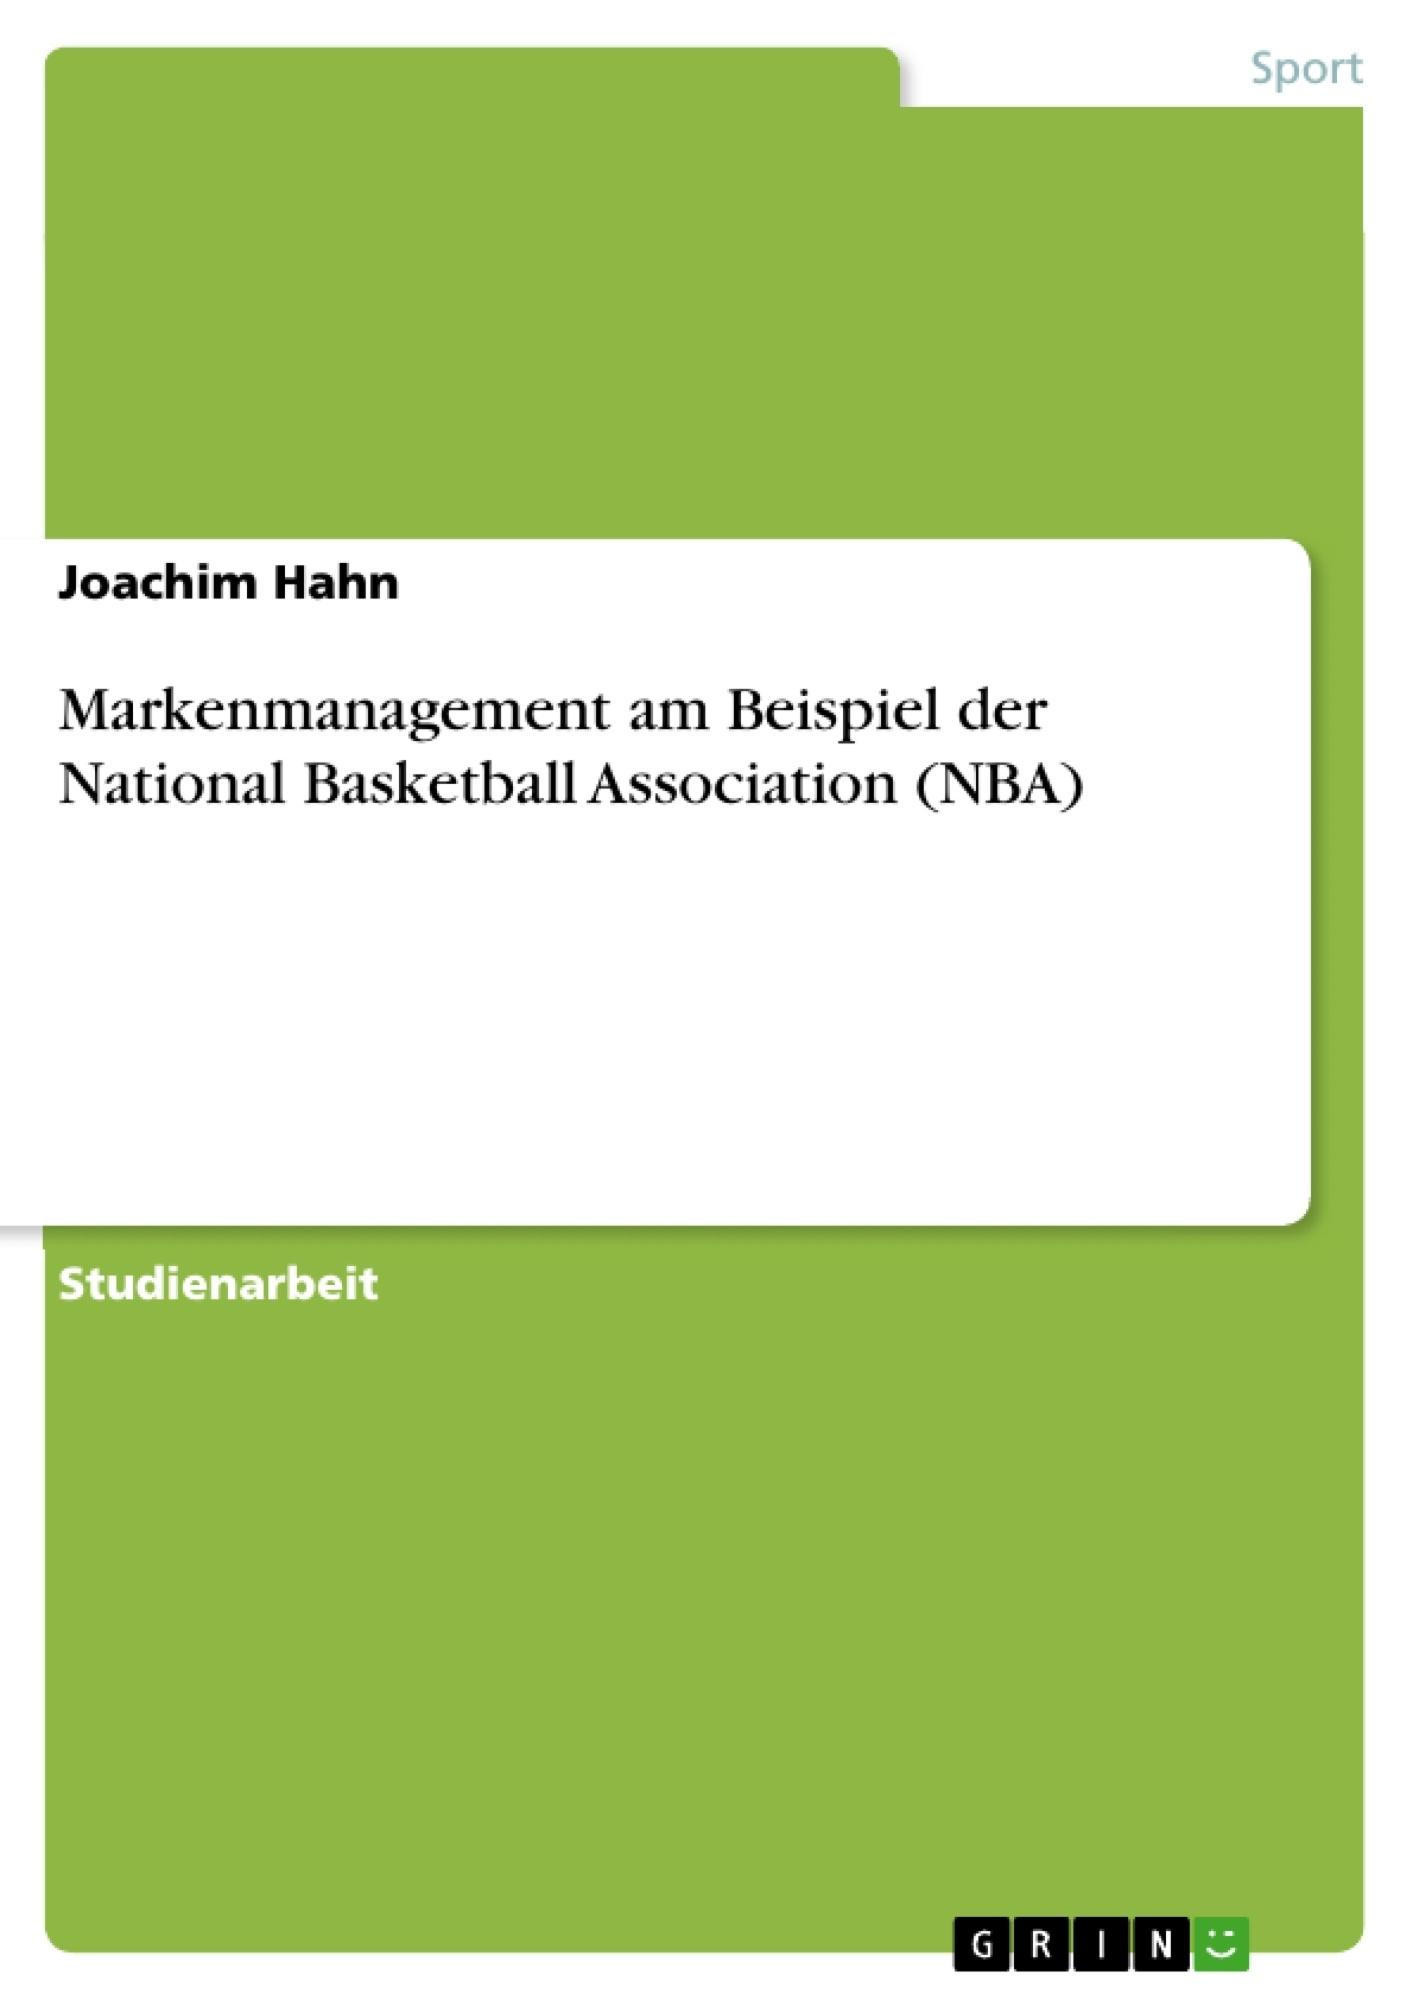 Titel: Markenmanagement am Beispiel der National Basketball Association (NBA)